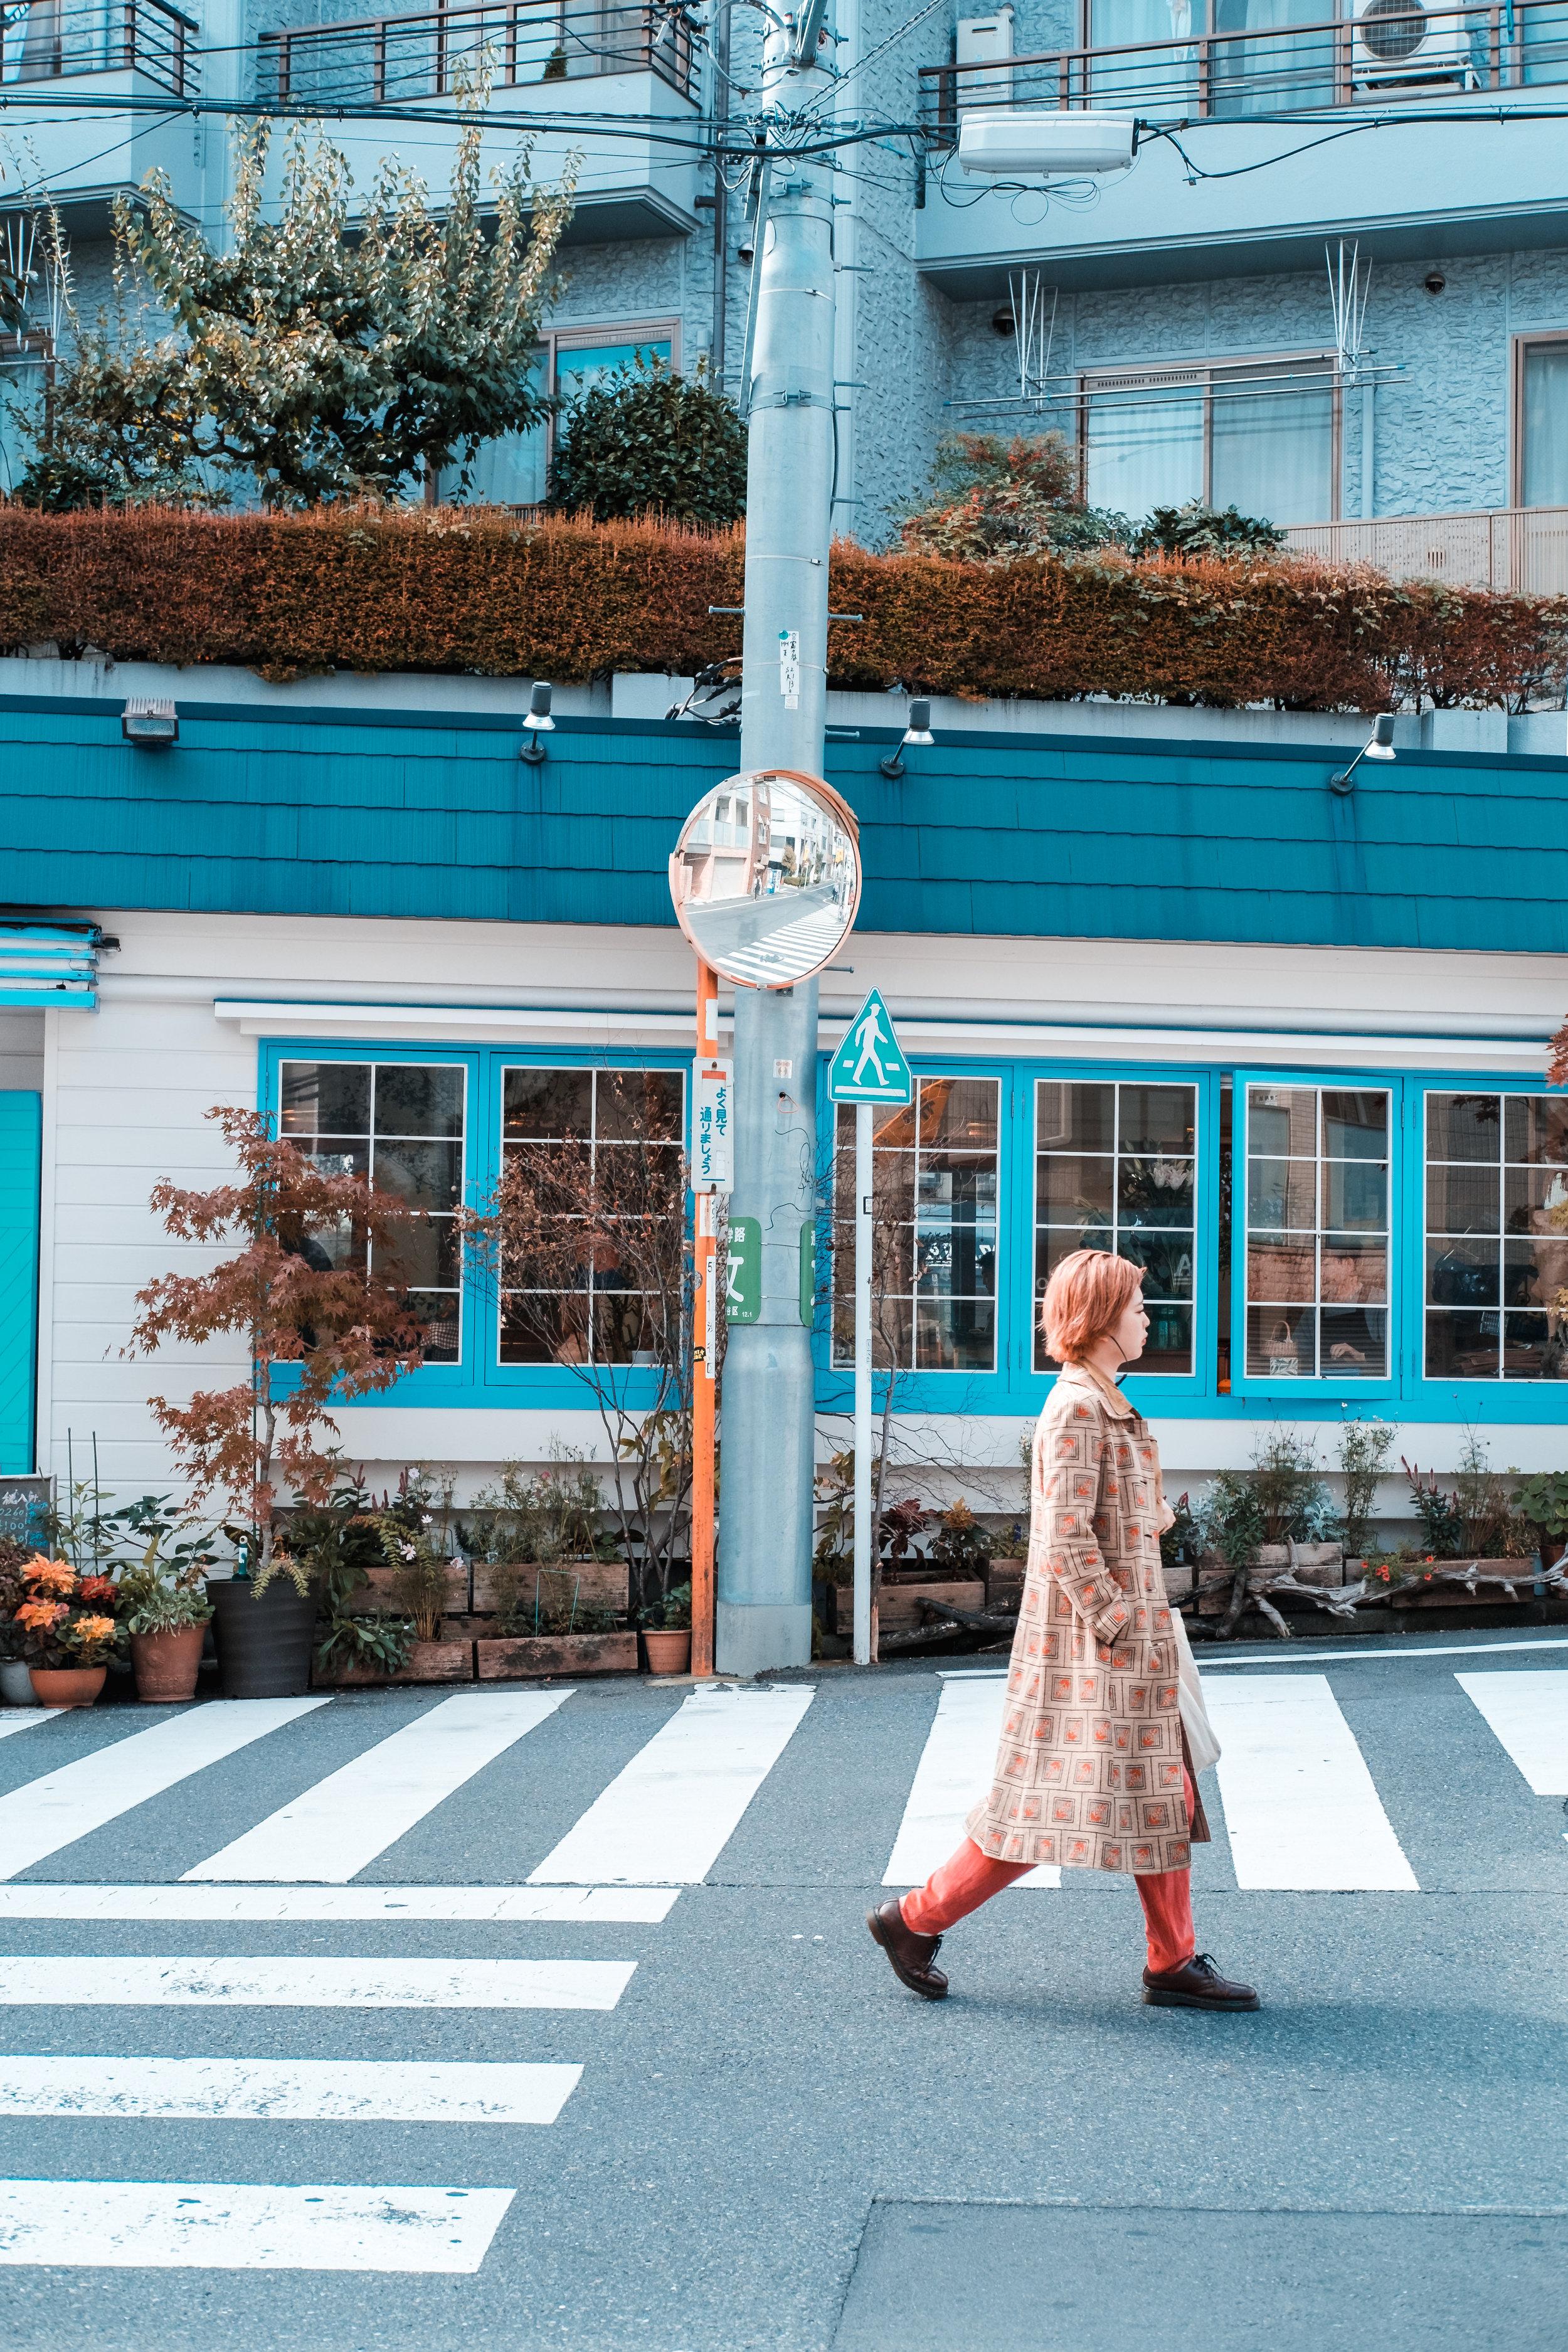 Tokyo_Nov_2018_AdamDillon_DSCF1113.jpg